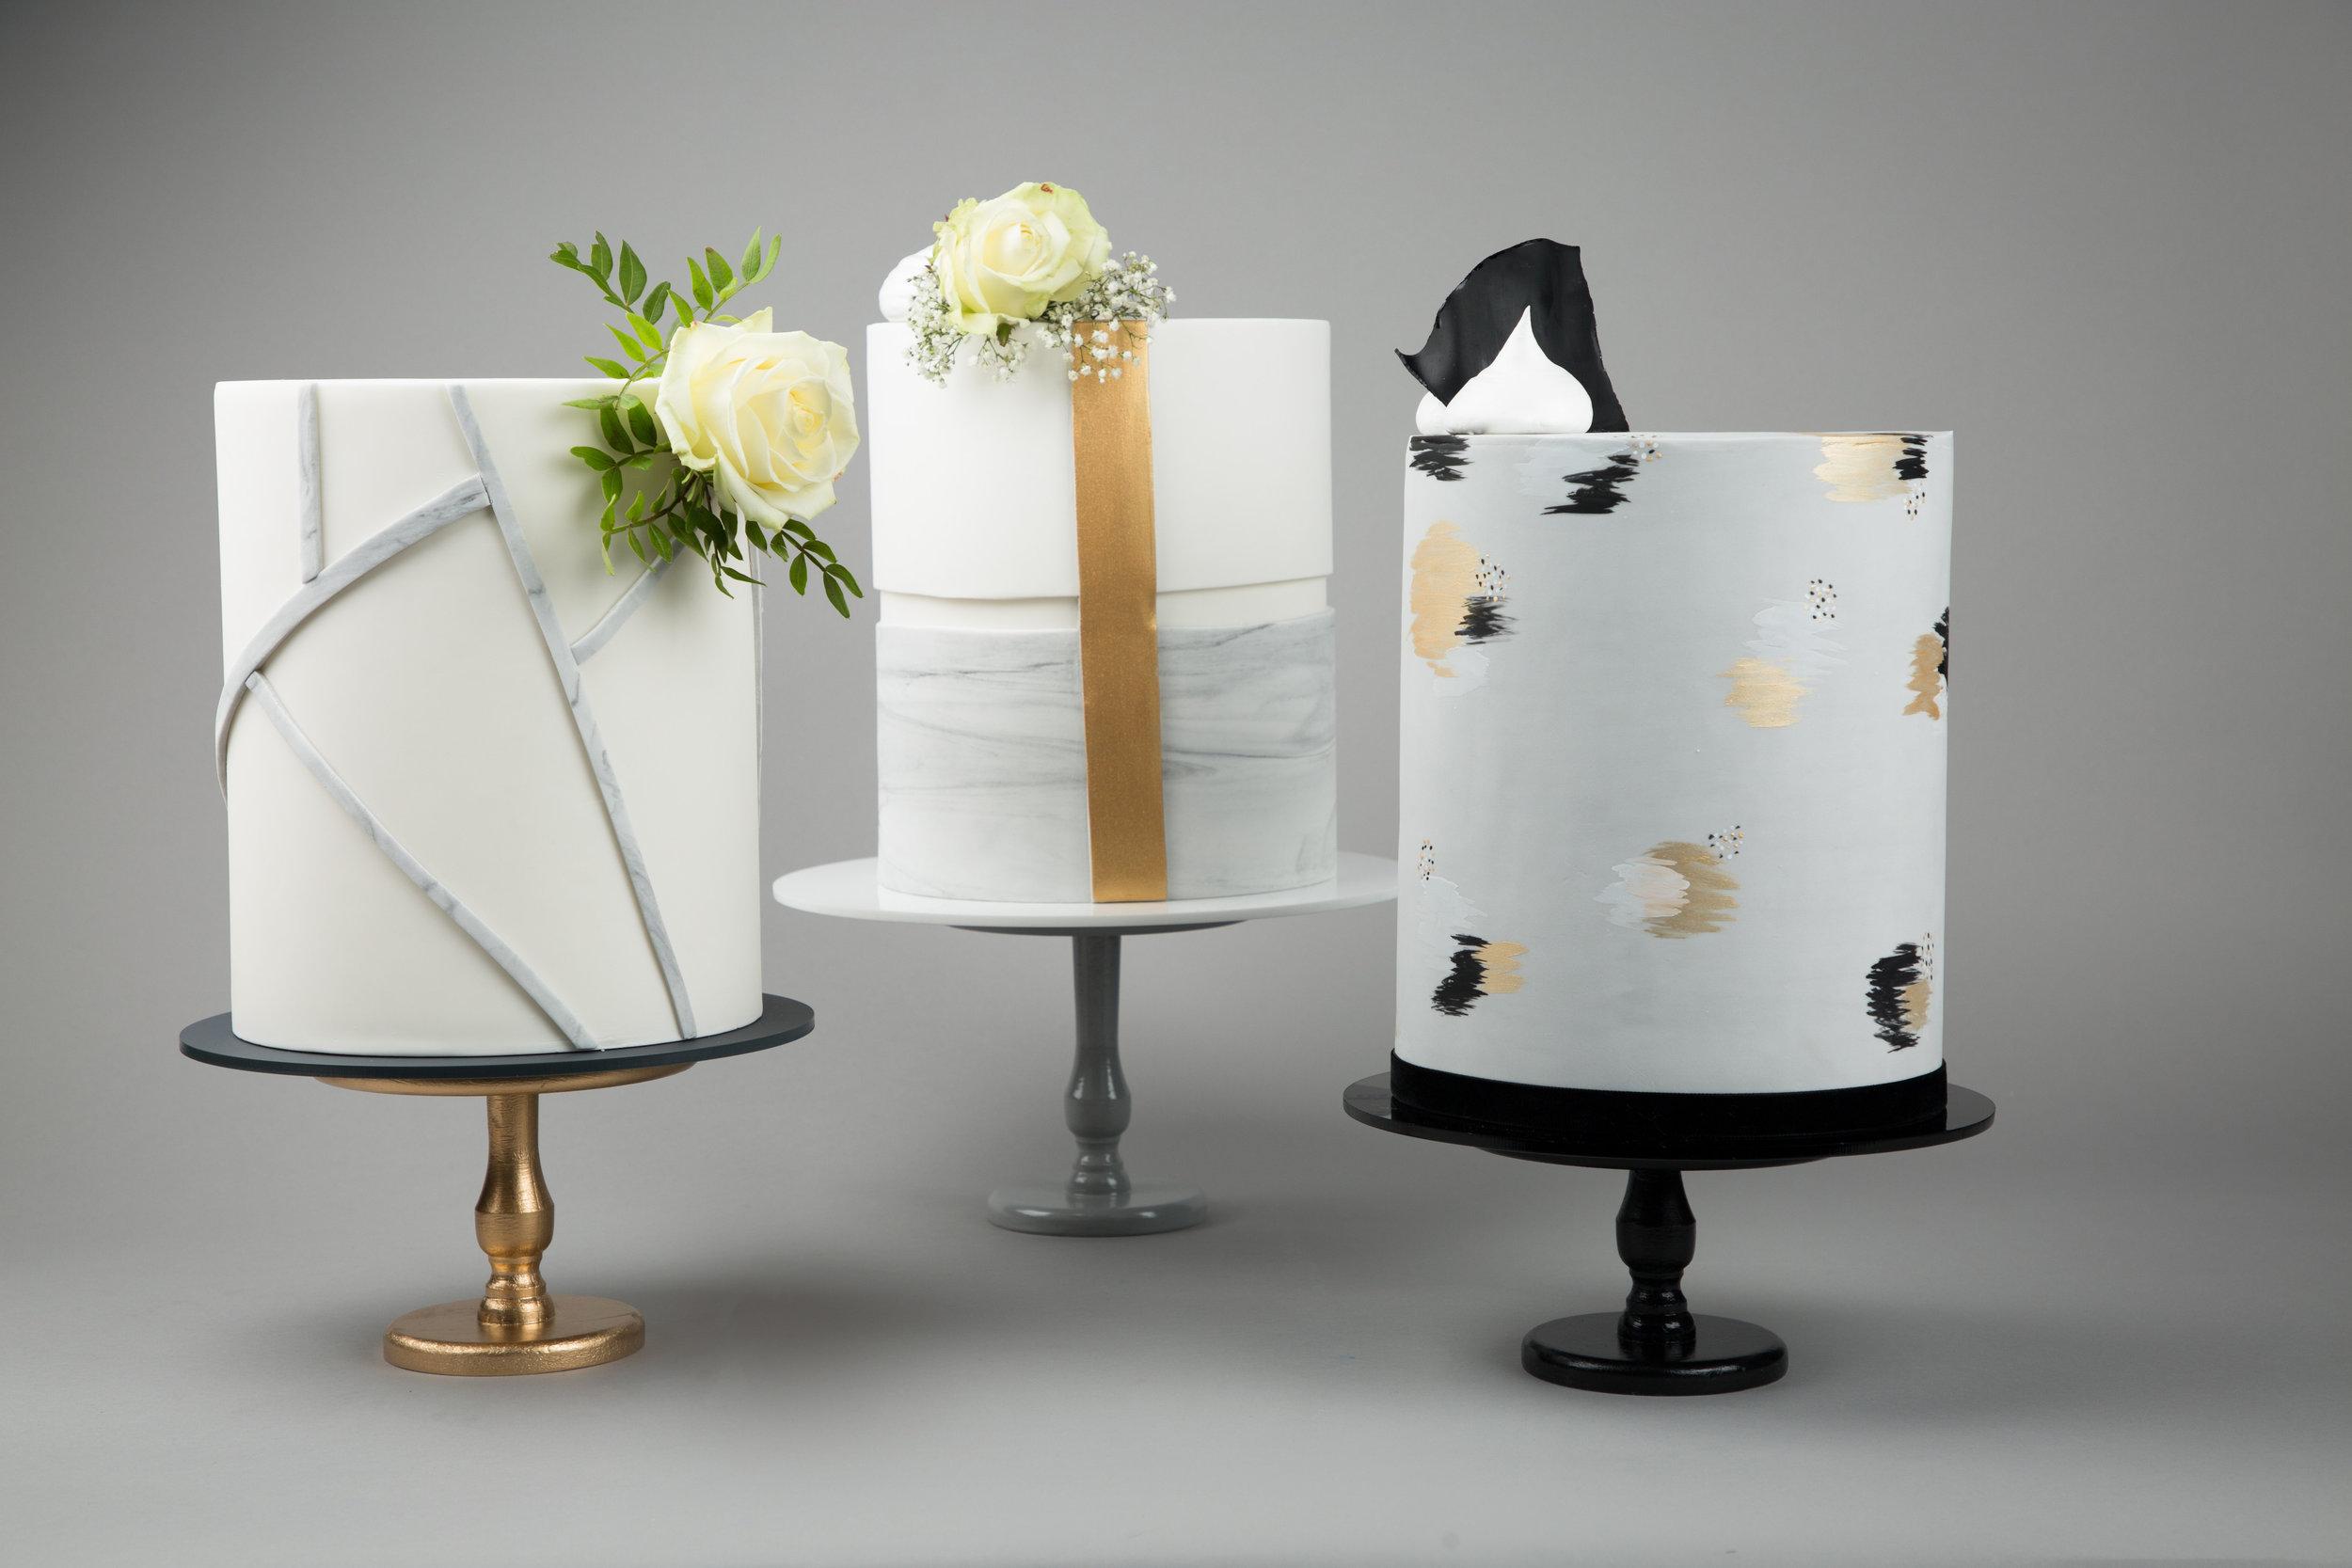 Holly Clarke Cake Design 3203-158 4800x3200.jpg